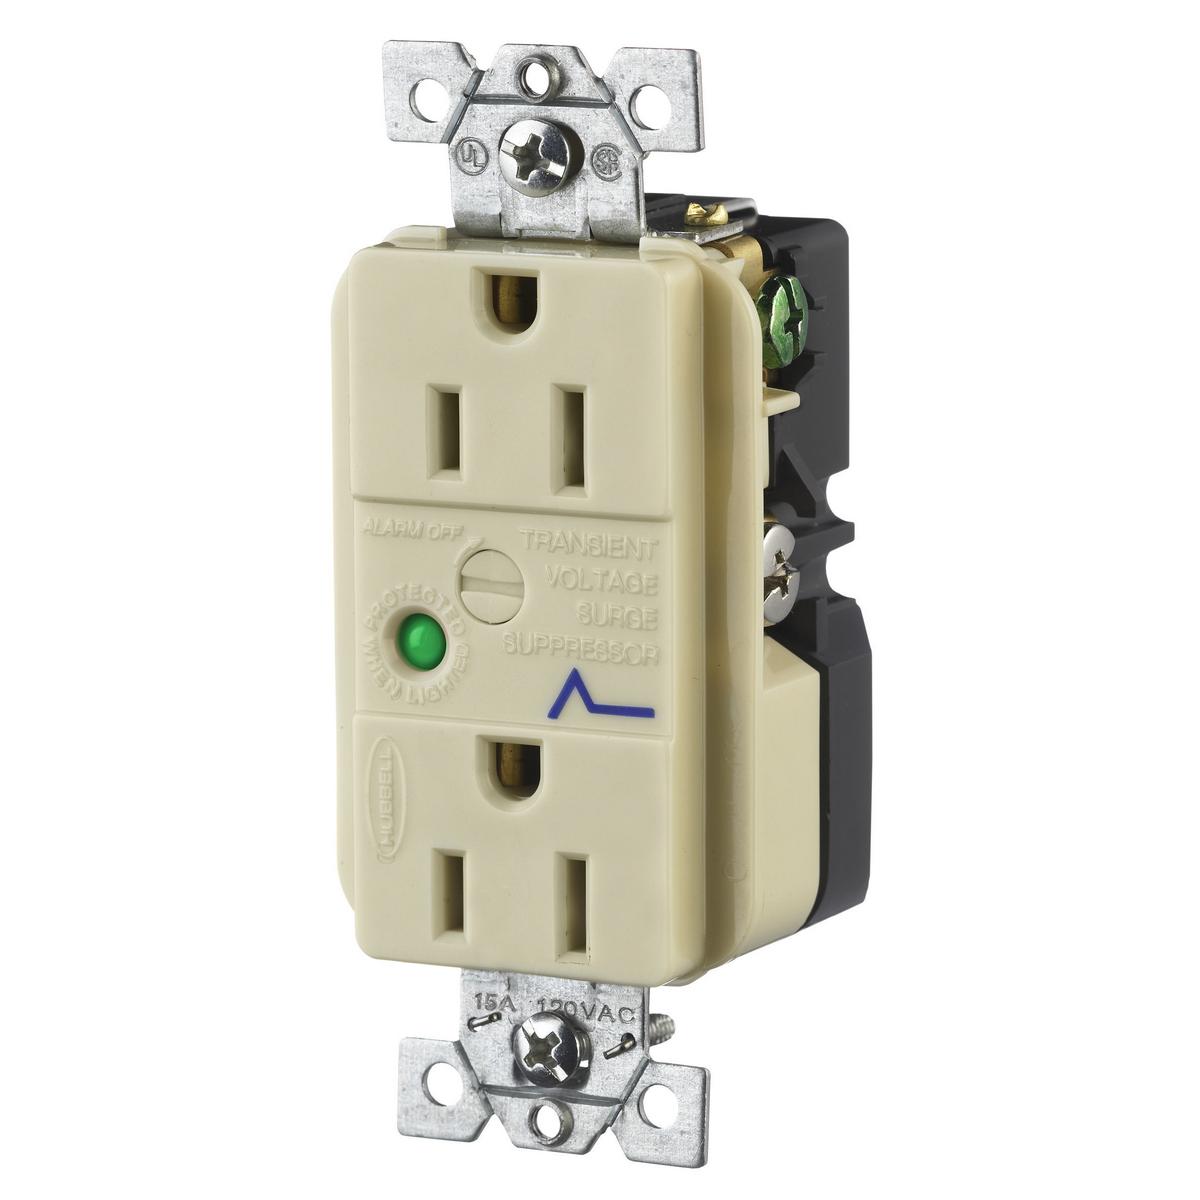 Hubbell HBL5260ISA 15 Amp 125 Volt 2-Pole 3-Wire NEMA 5-15R Ivory Duplex Surge Suppression Receptacle